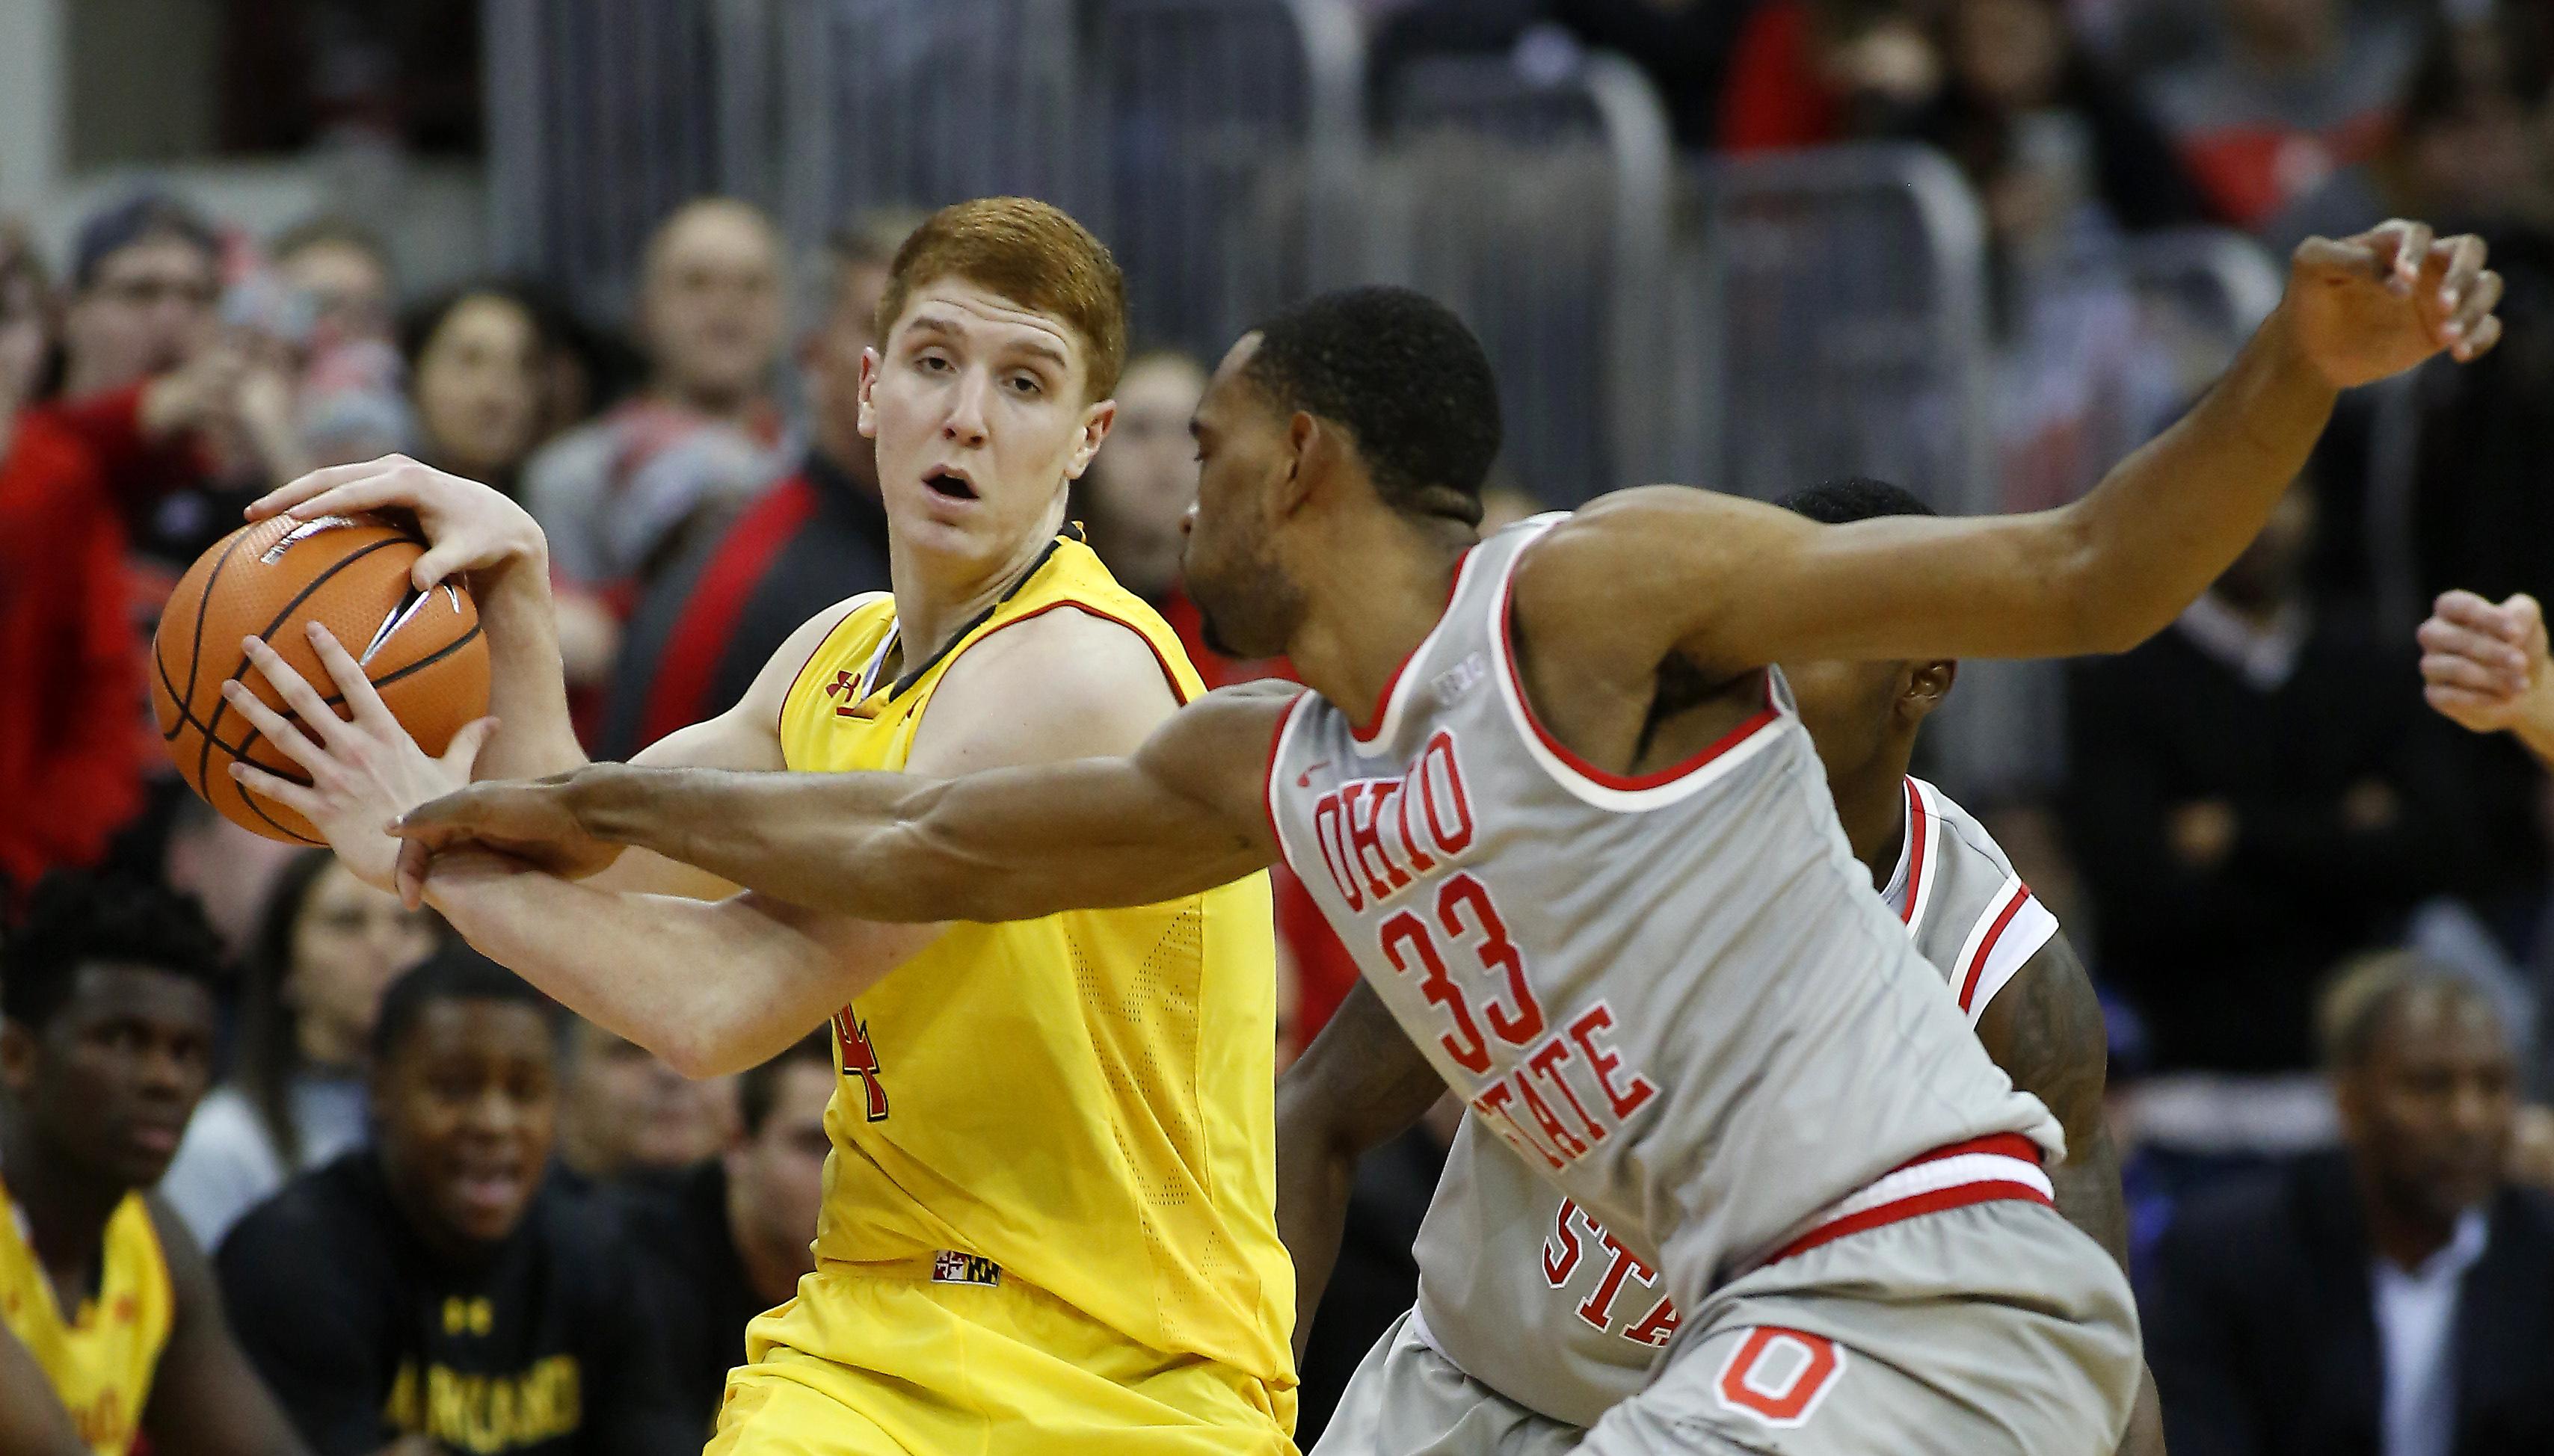 NCAA Basketball: Maryland at Ohio State